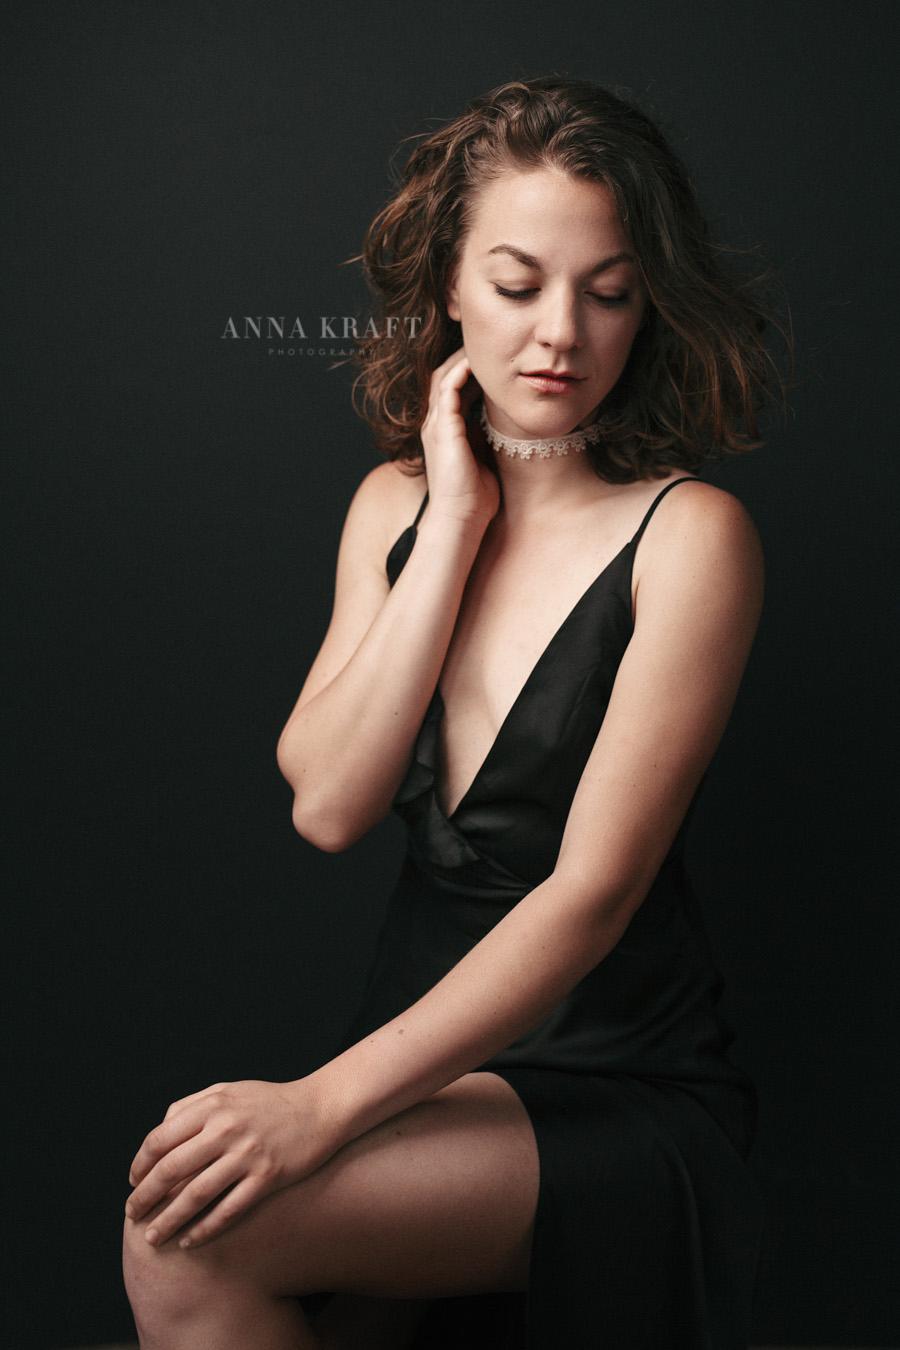 anna_kraft_photography_georgetown_square_studio_family_portrait-26.jpg